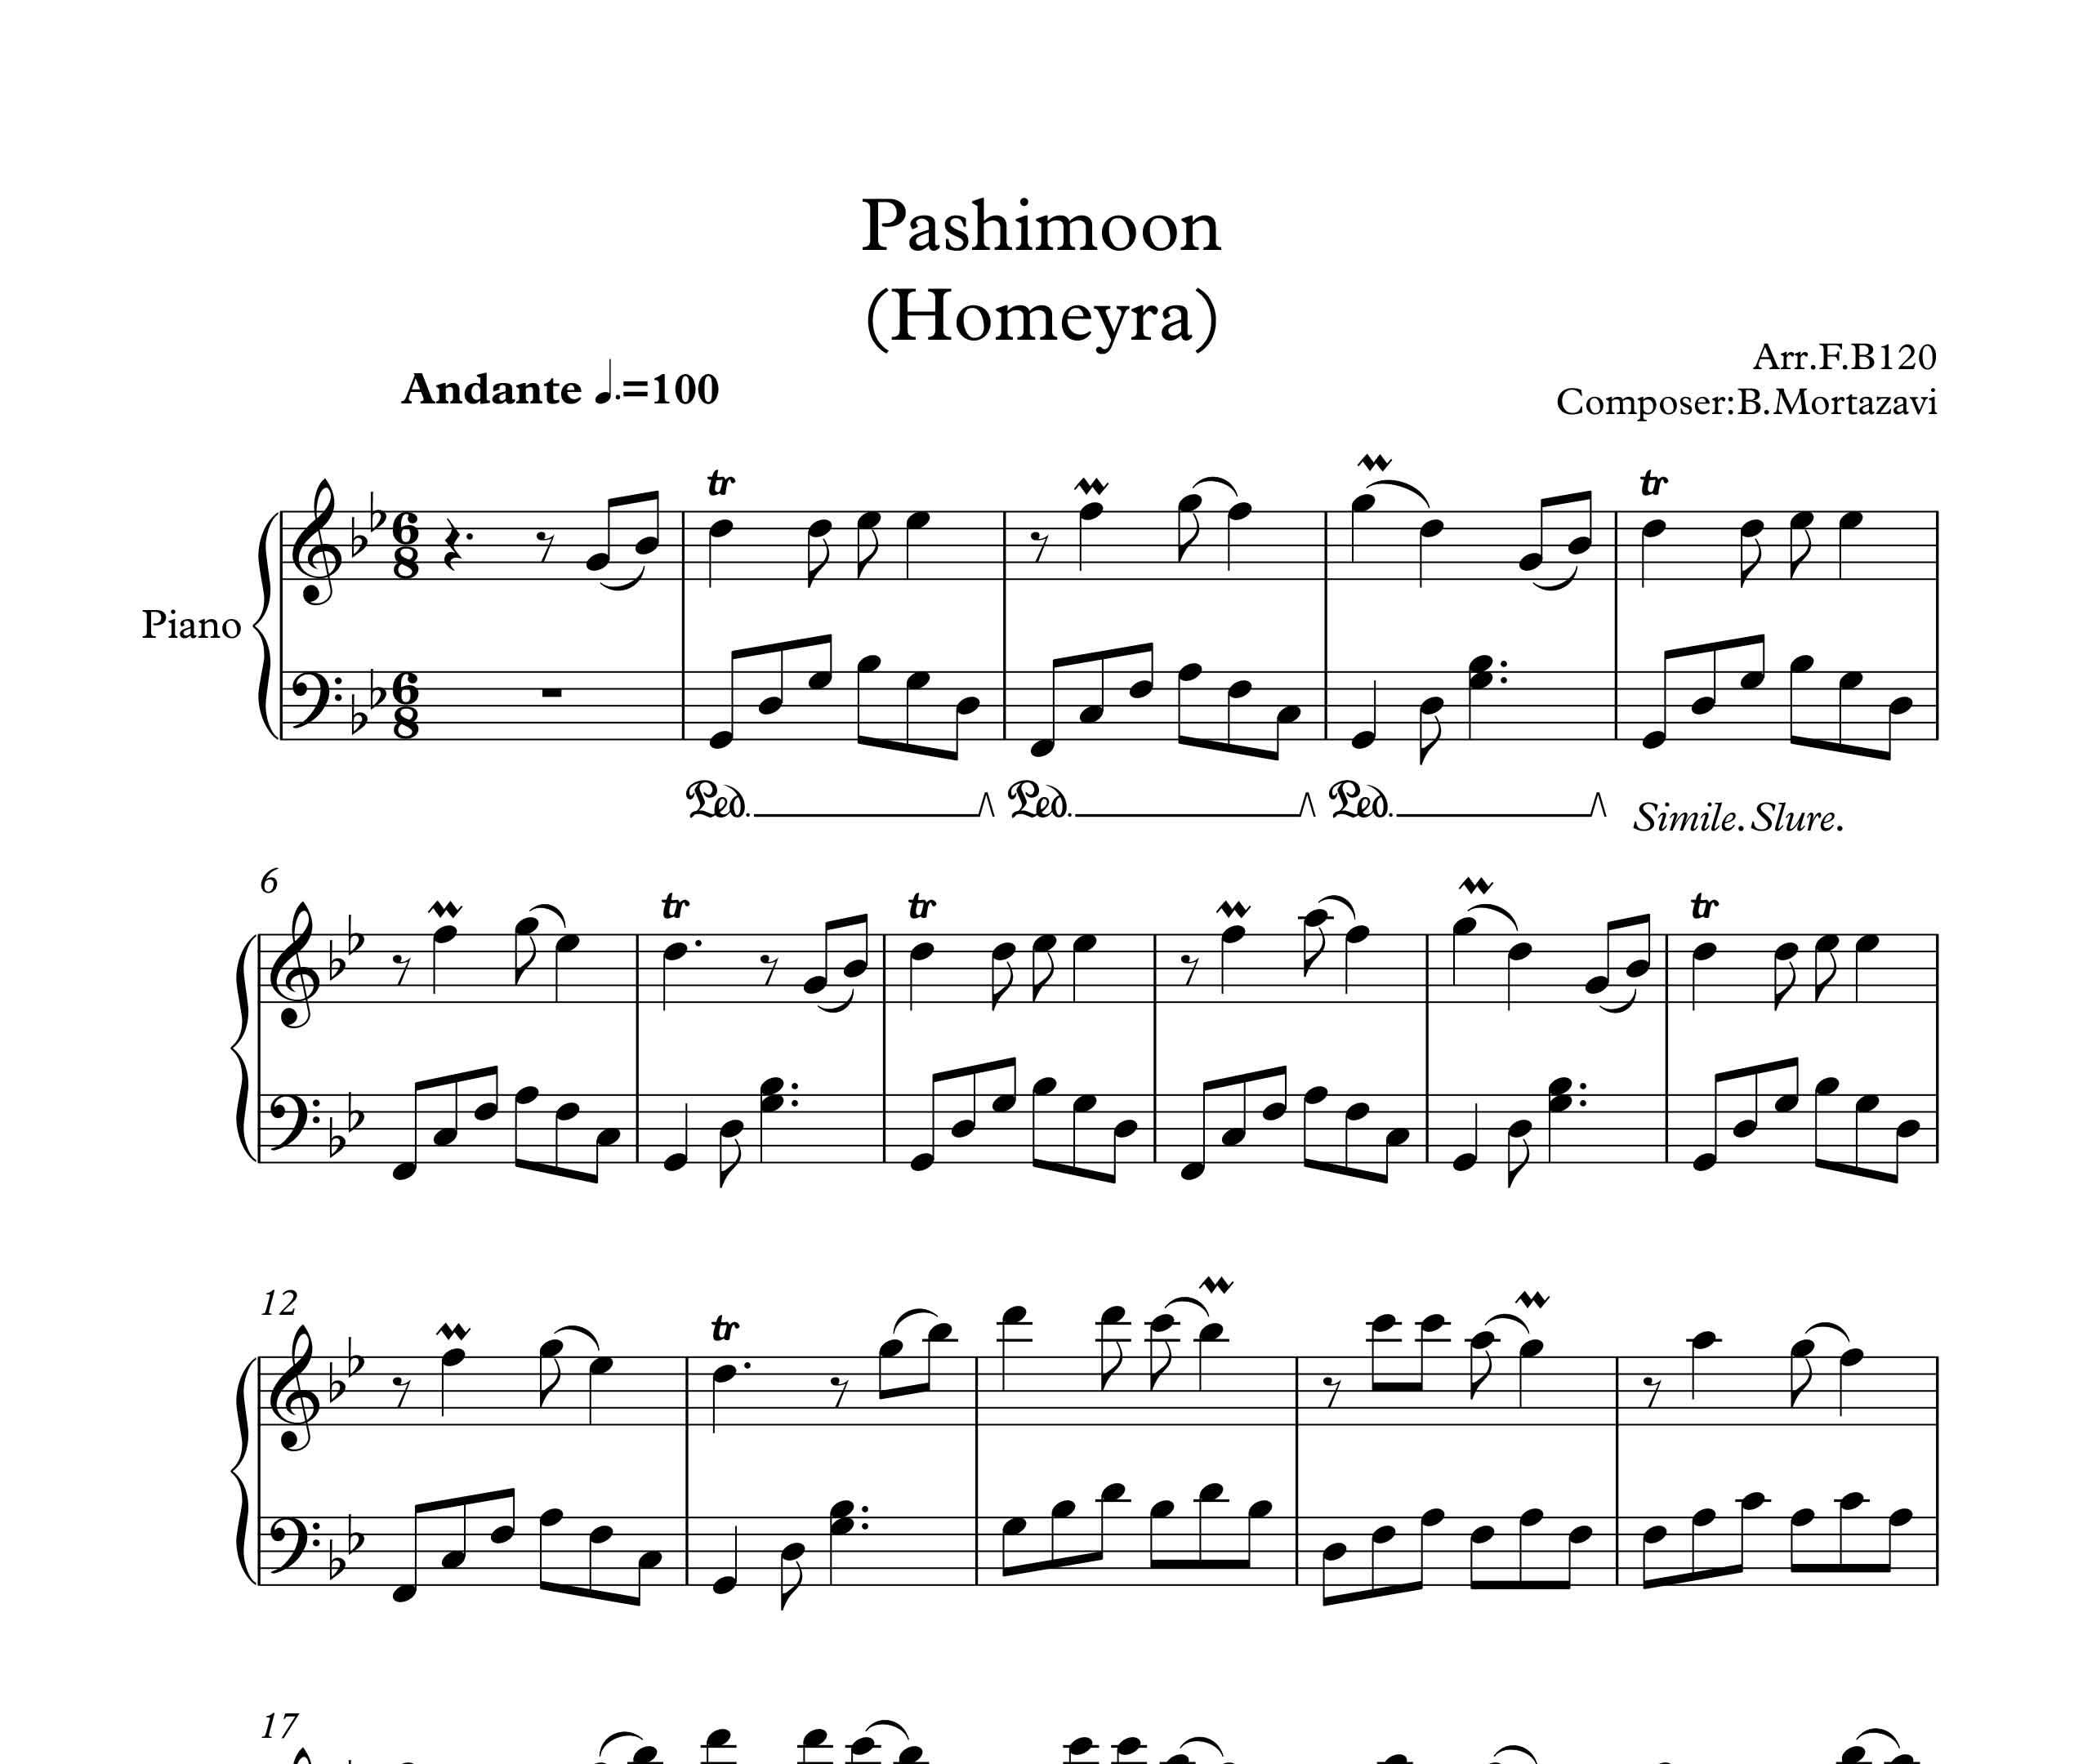 نت آهنگ پشیمون برای پیانو